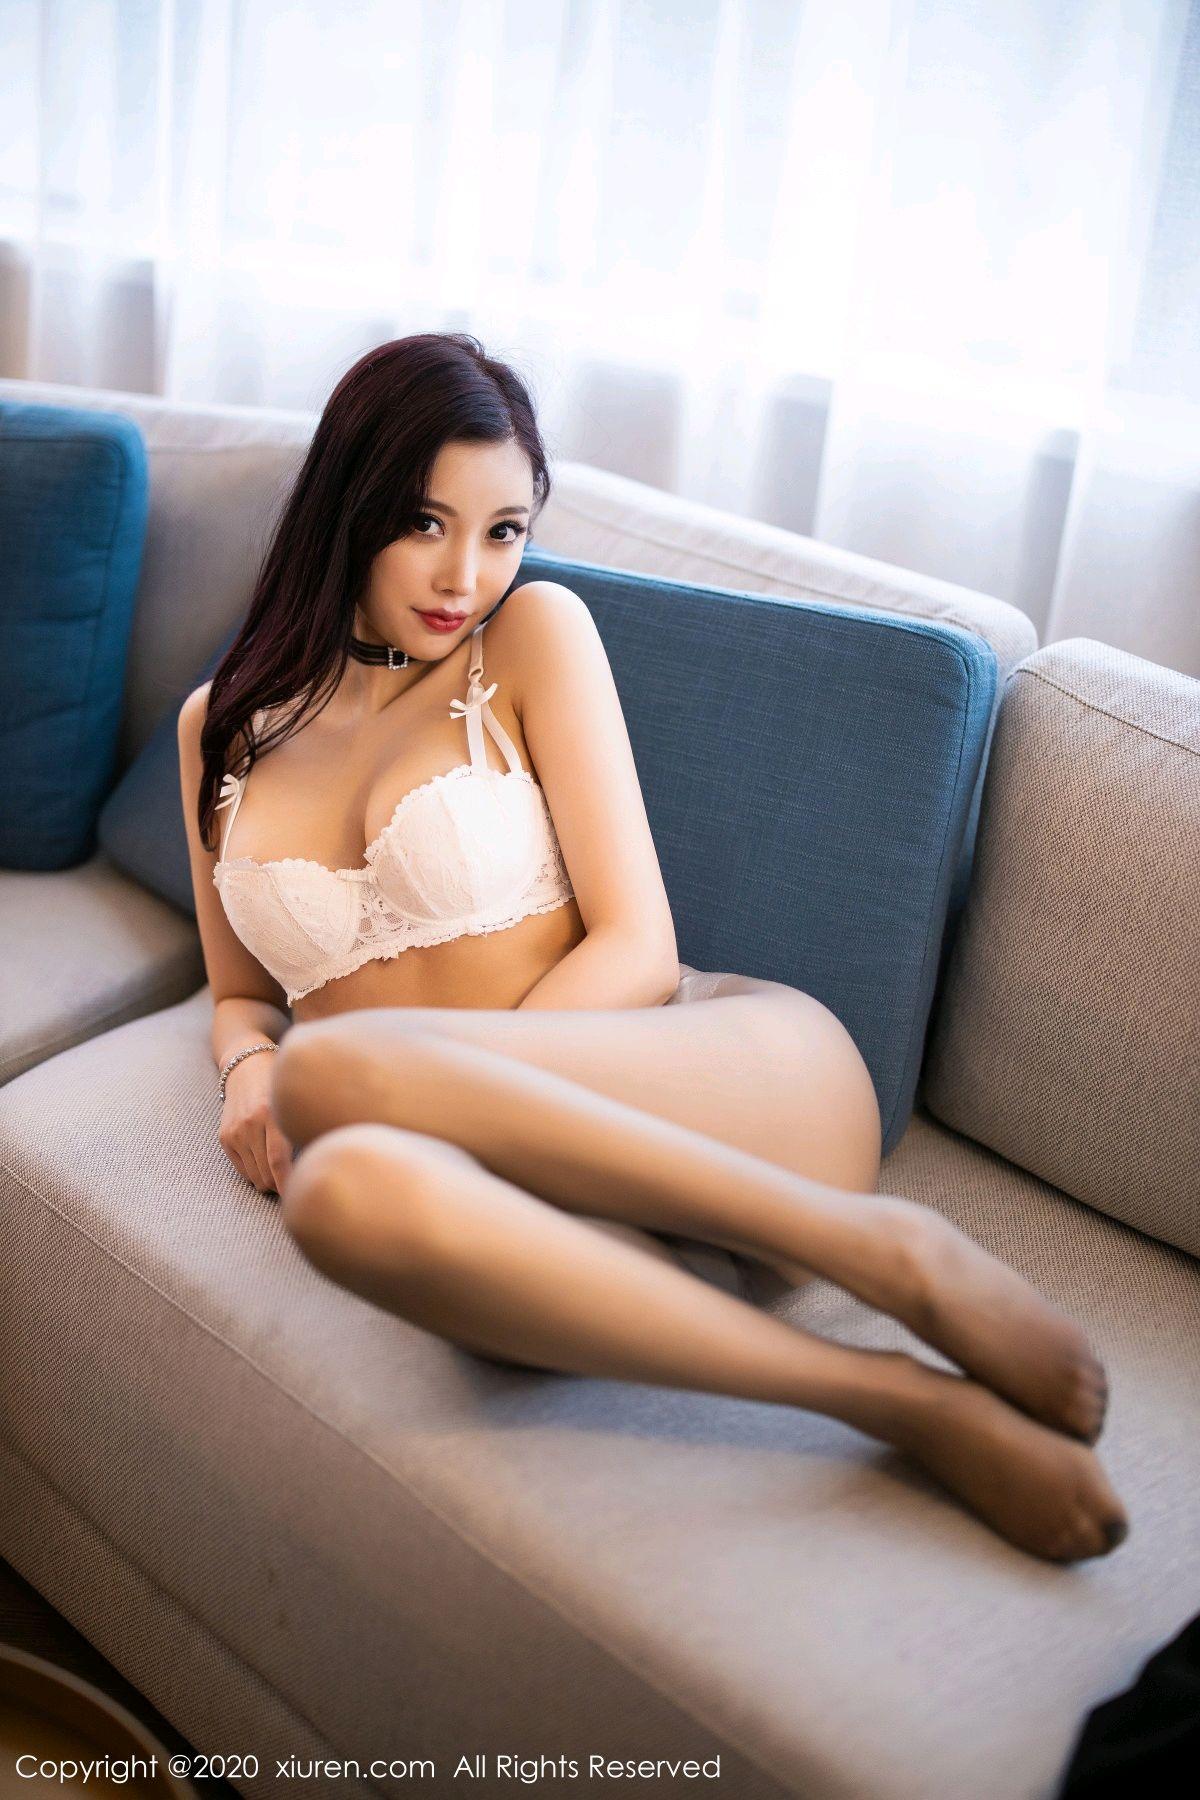 [XiuRen] Vol.2241 Yang Chen Chen 28P, Underwear, Xiuren, Yang Chen Chen